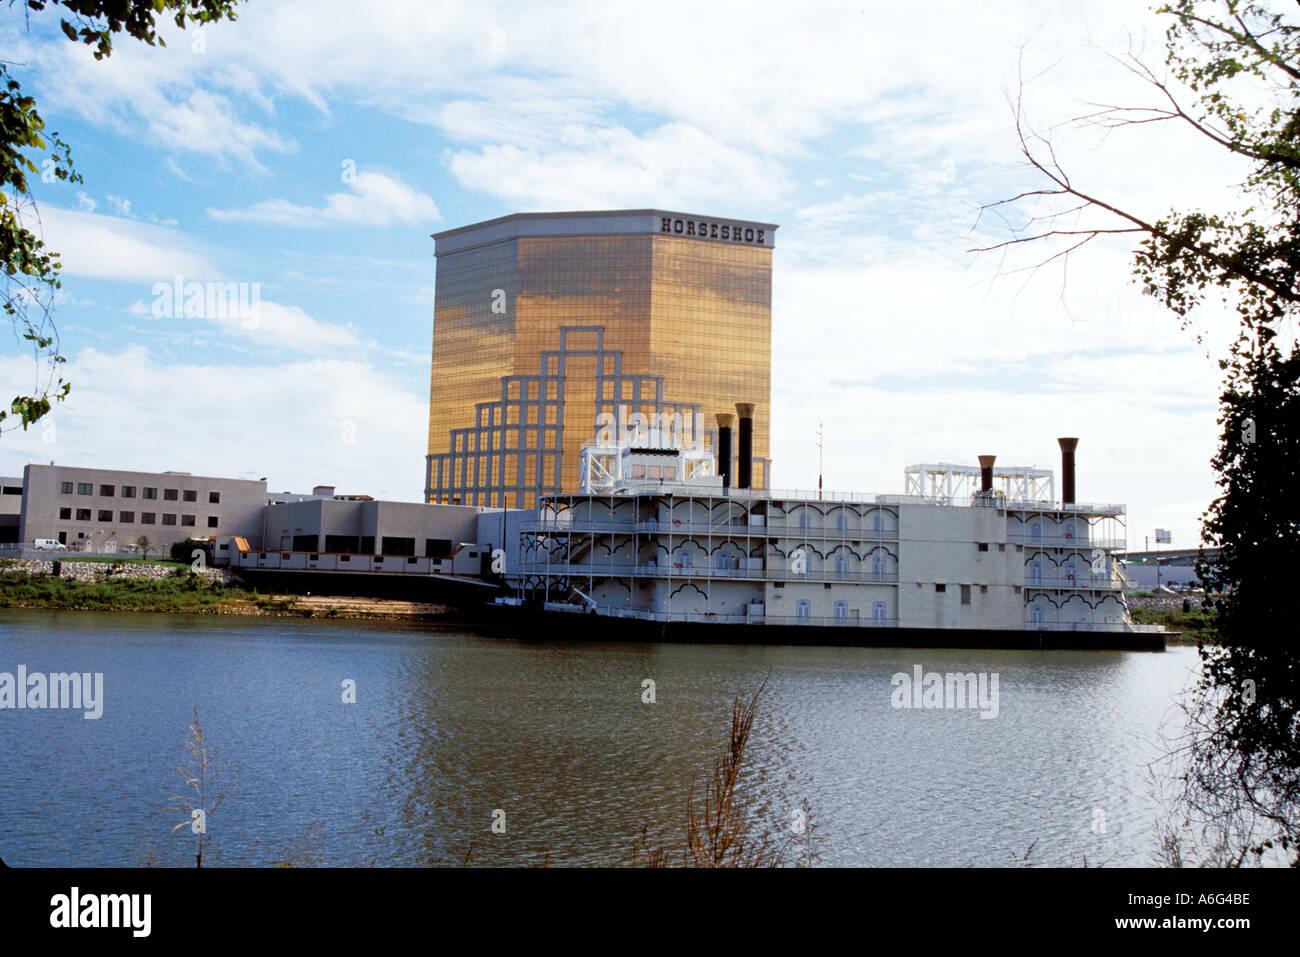 Shreveport louisiana gambling online gambling and betting casino